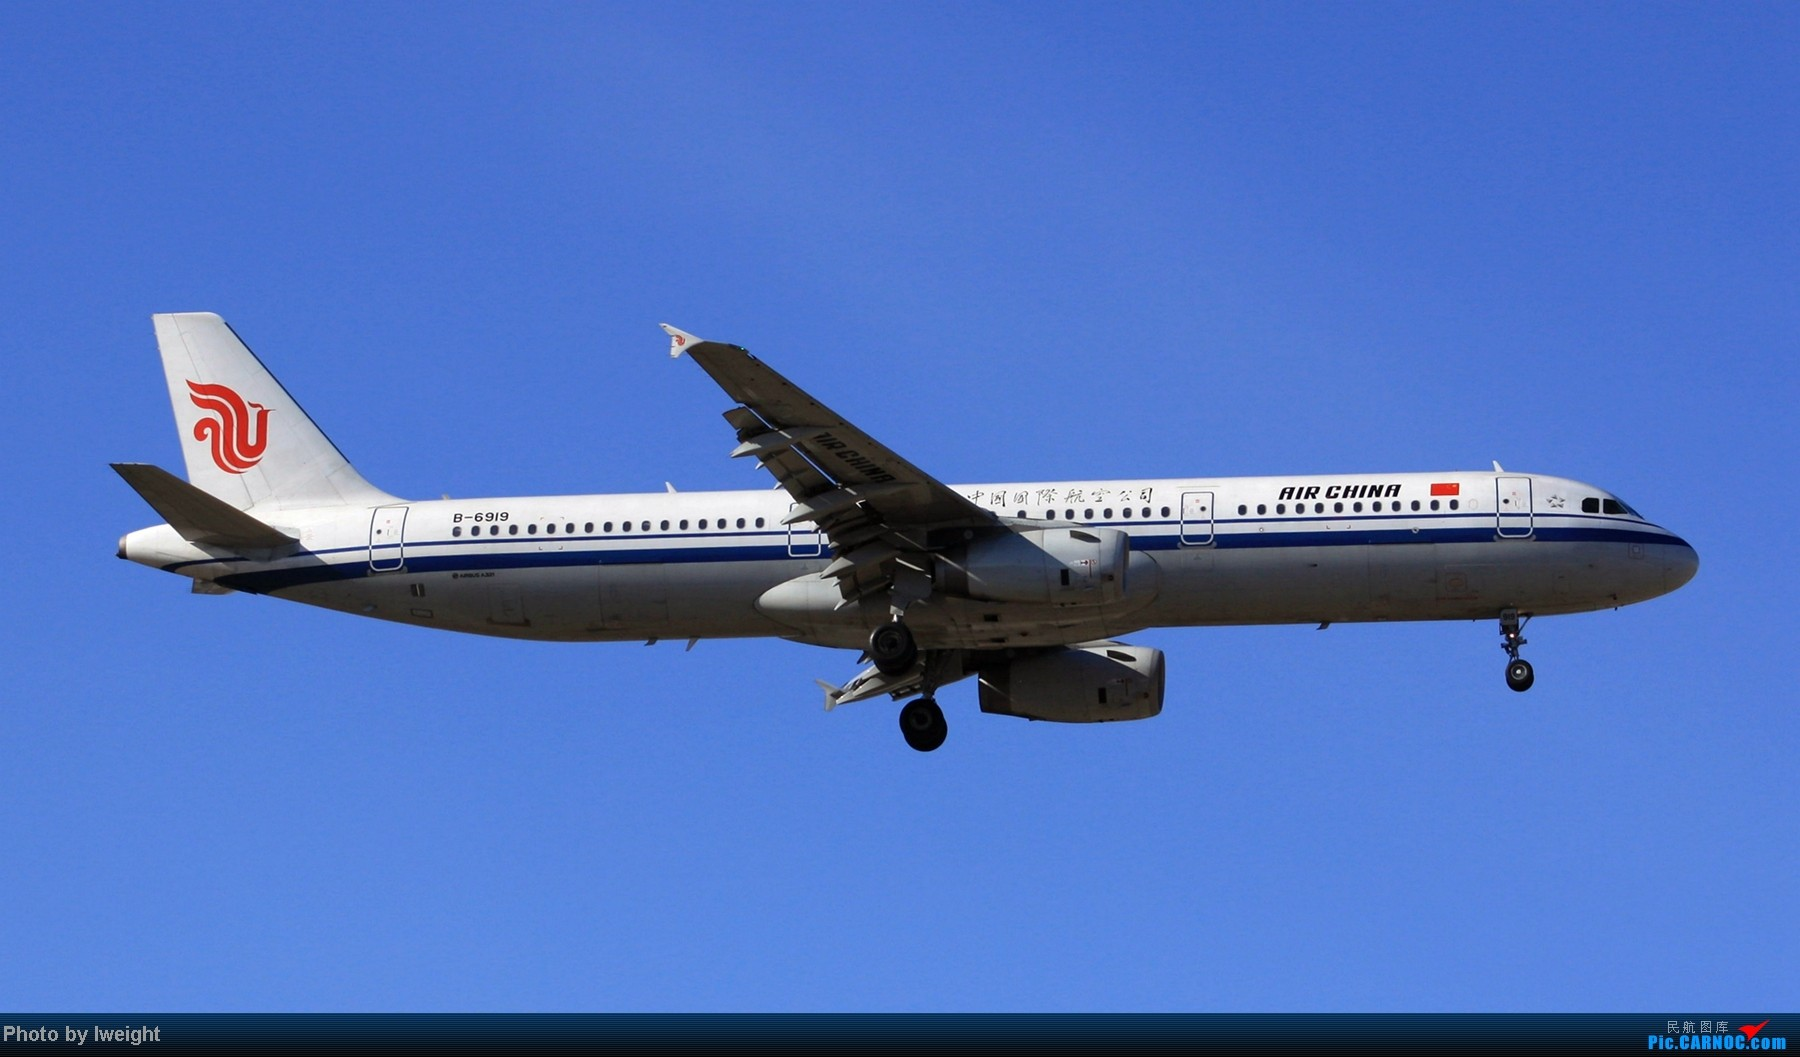 Re:[原创]春节期间首都机场拍机汇报 AIRBUS A321-200 B-6919 中国北京首都机场